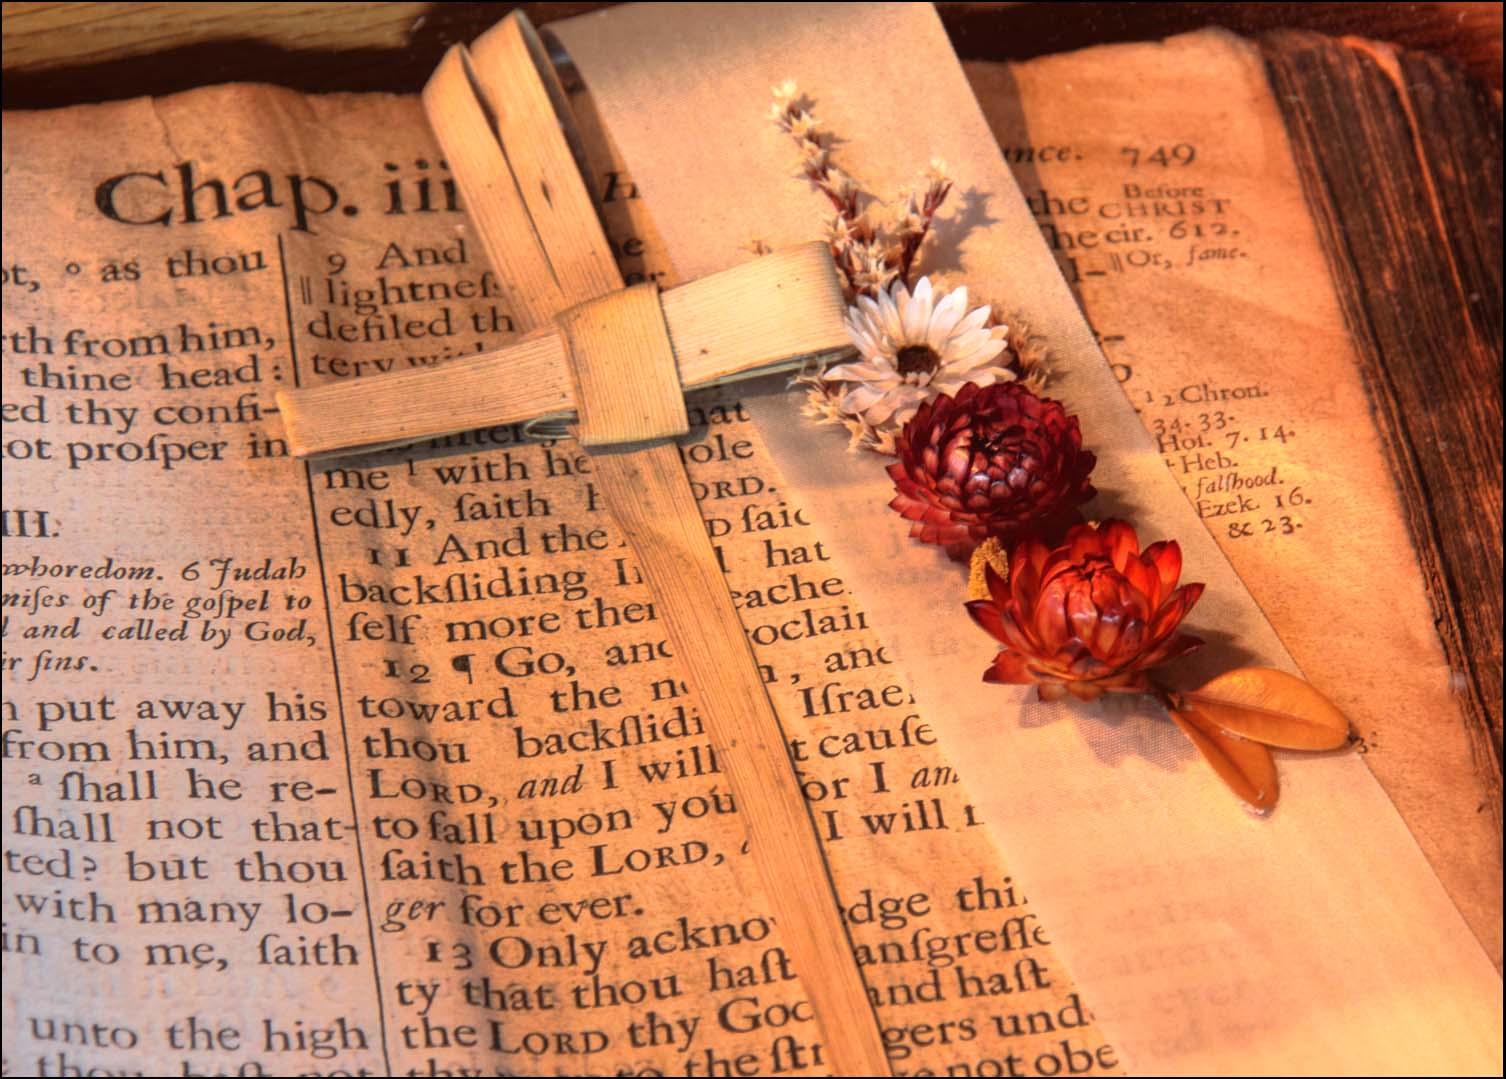 old,church,bible,lent,cross,palm,sunday,open,Middlewich,St,saint,michaels,cheshire,UK,365days,book,books,scripture,text,stillife,stilllife,still,life,stuff,hotpix!